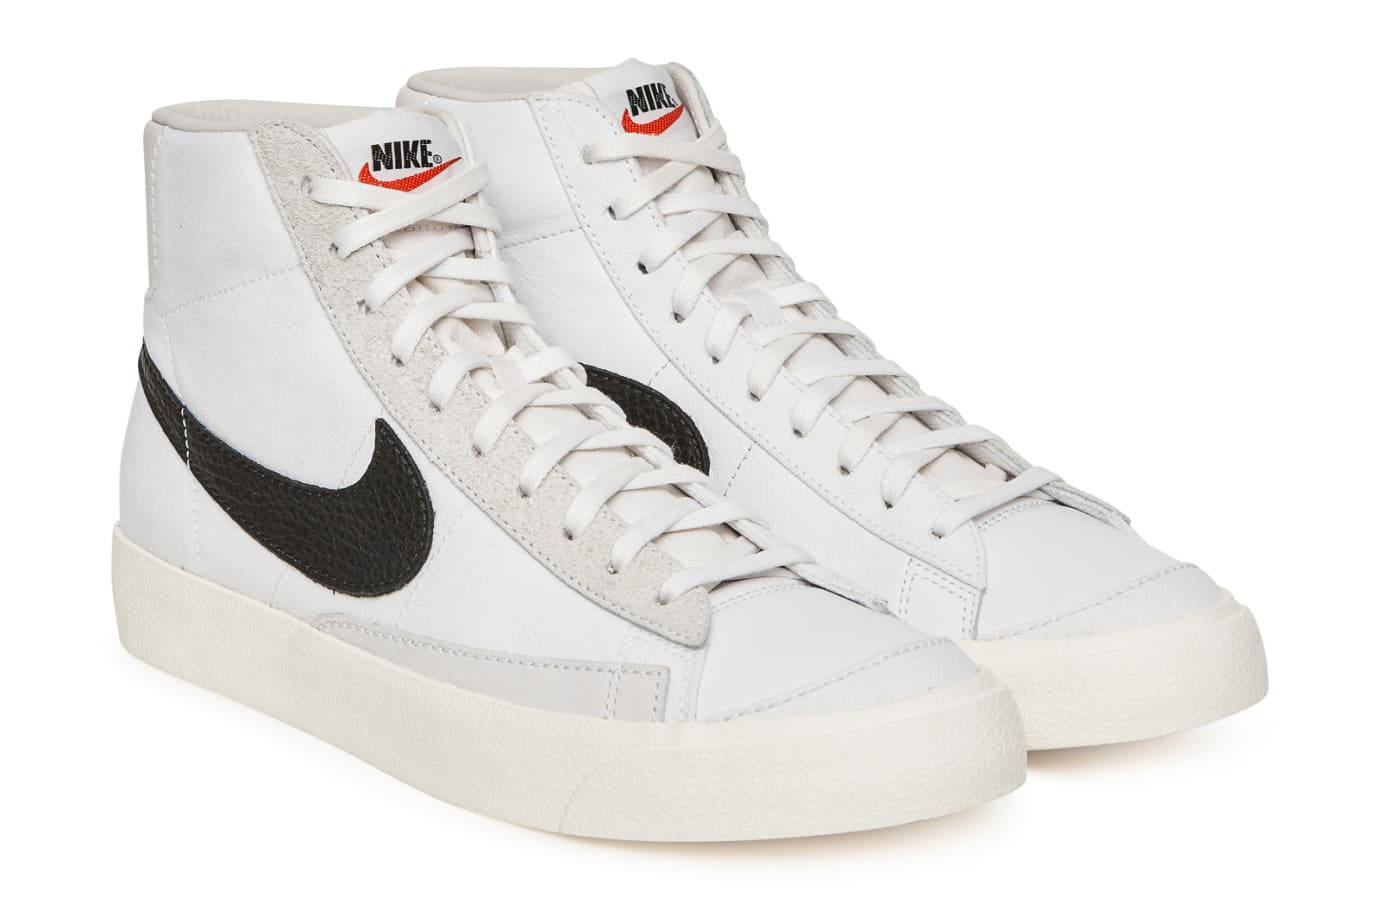 online store sale online classic style Slam Jam x Nike Blazer Mid 'Class 1977' Release Date | Sole ...